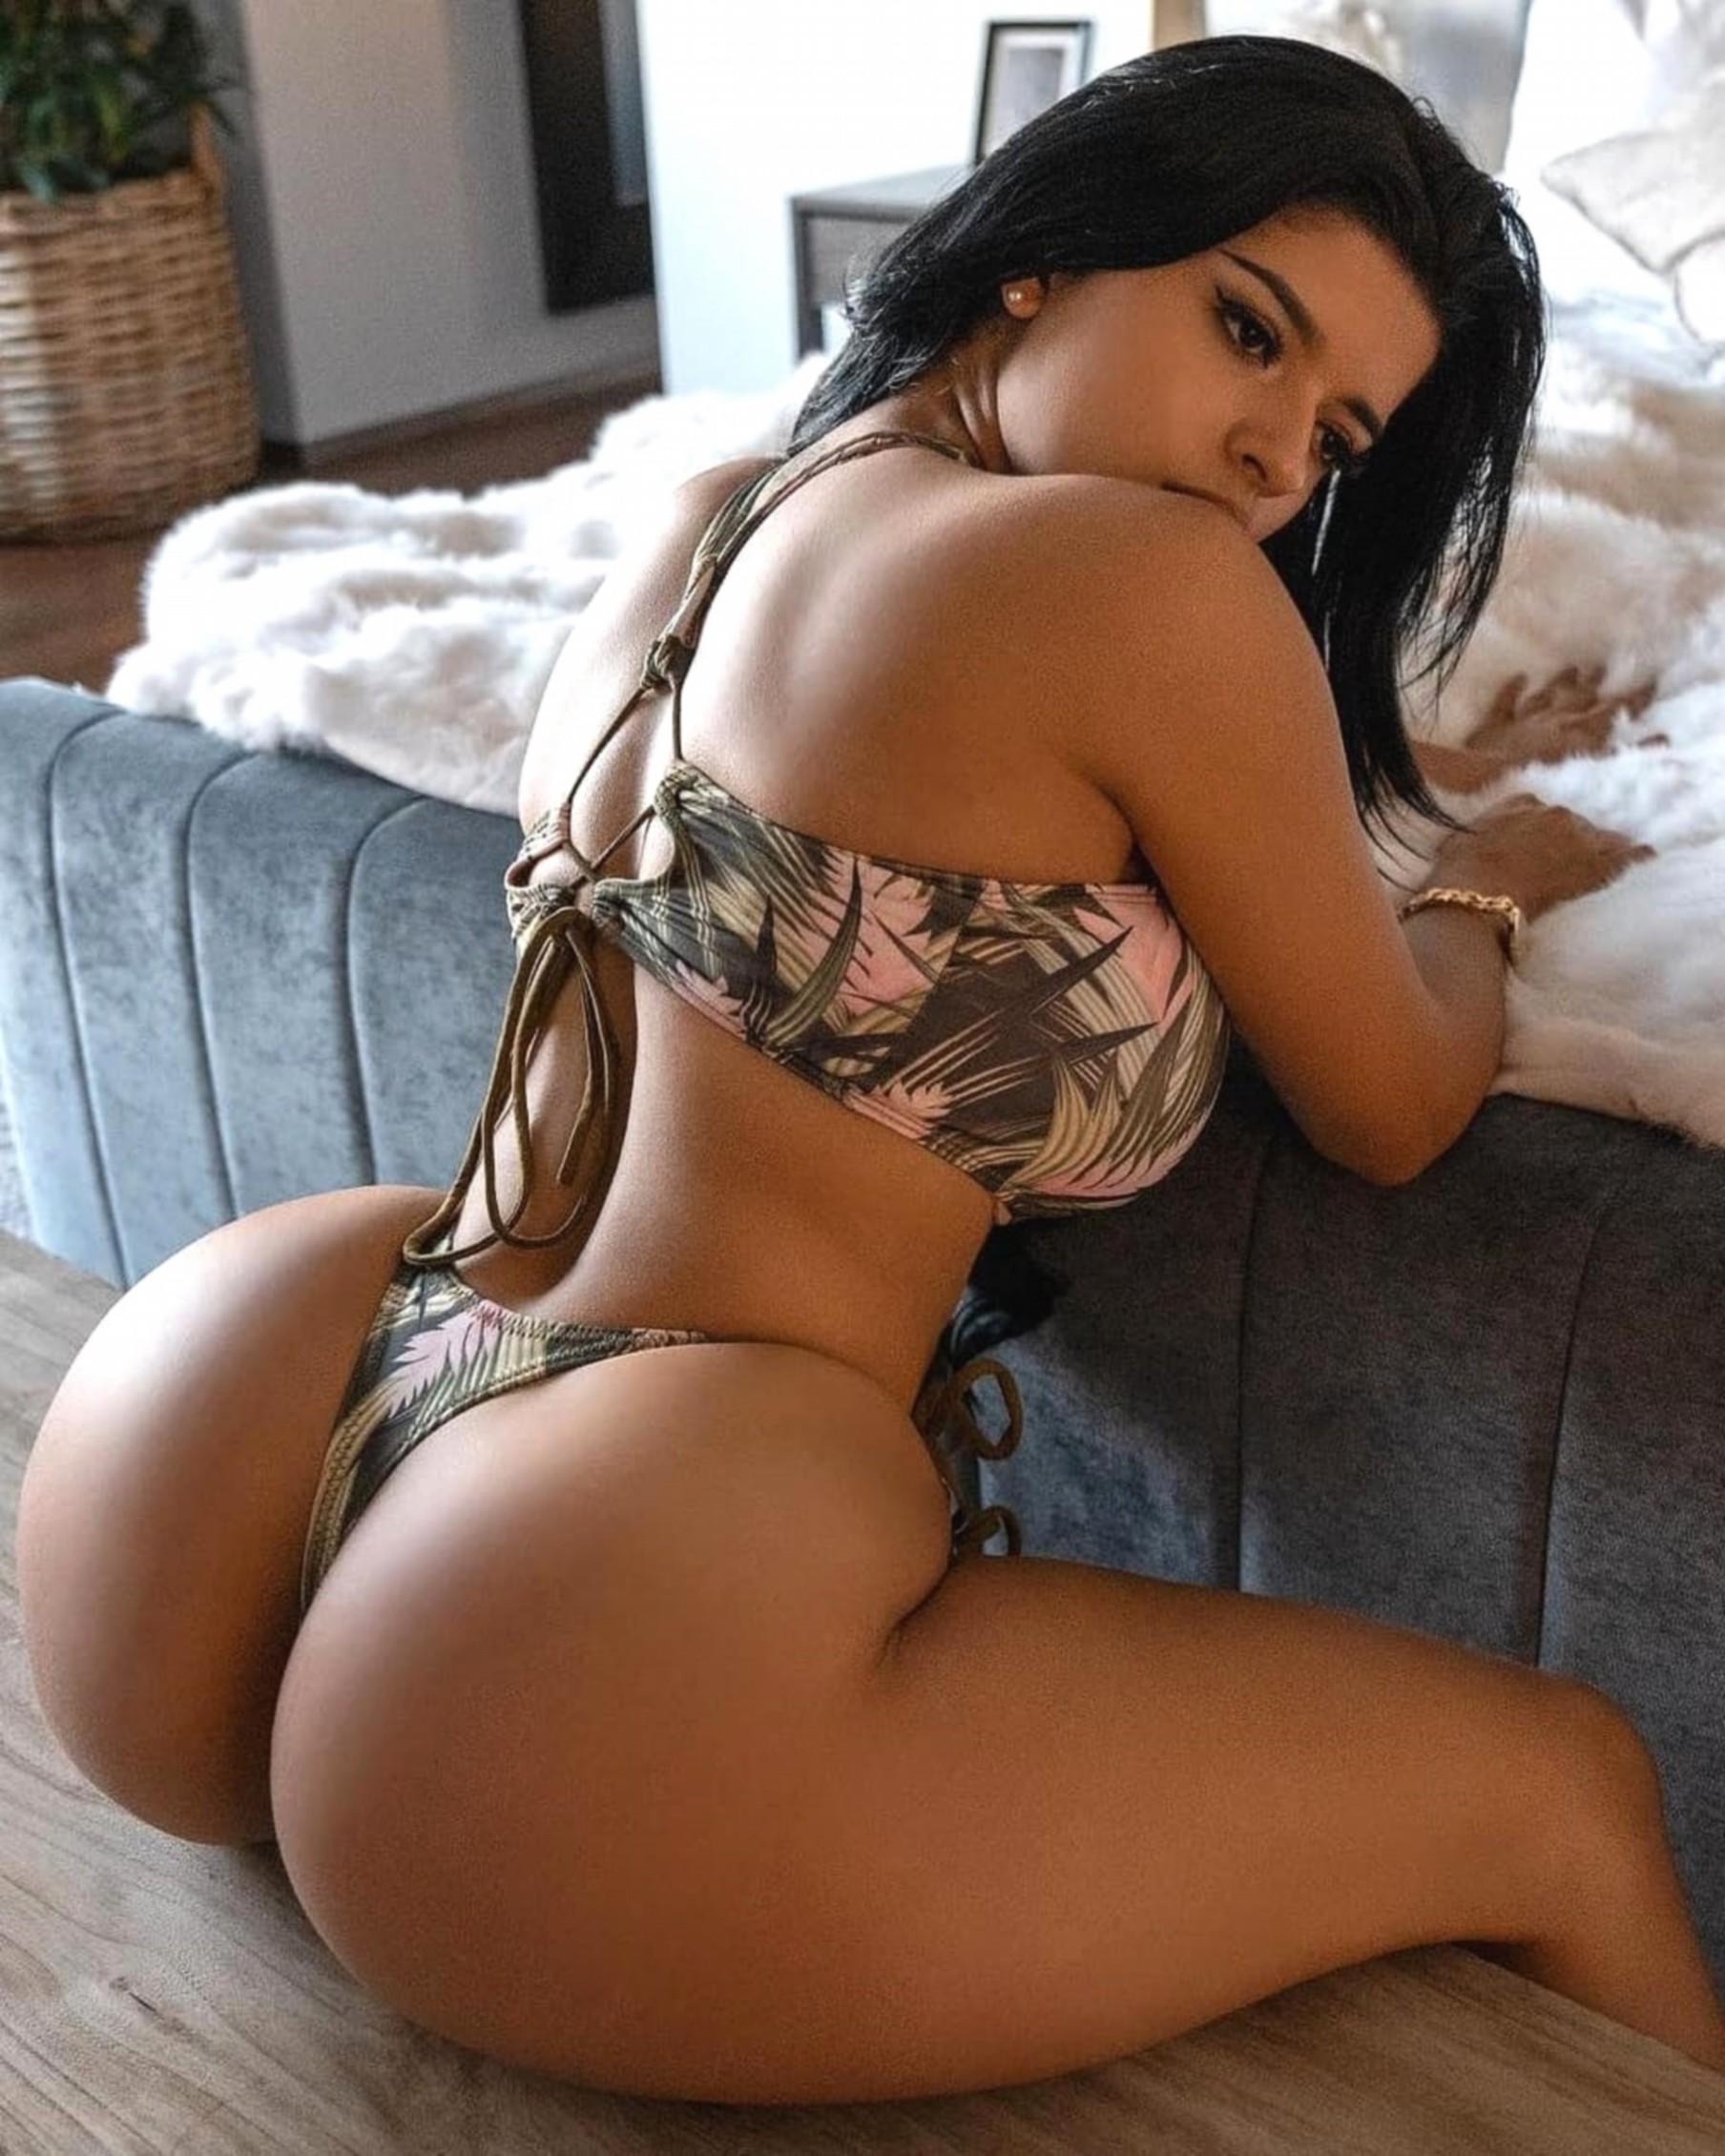 Black girl naked getting fucked